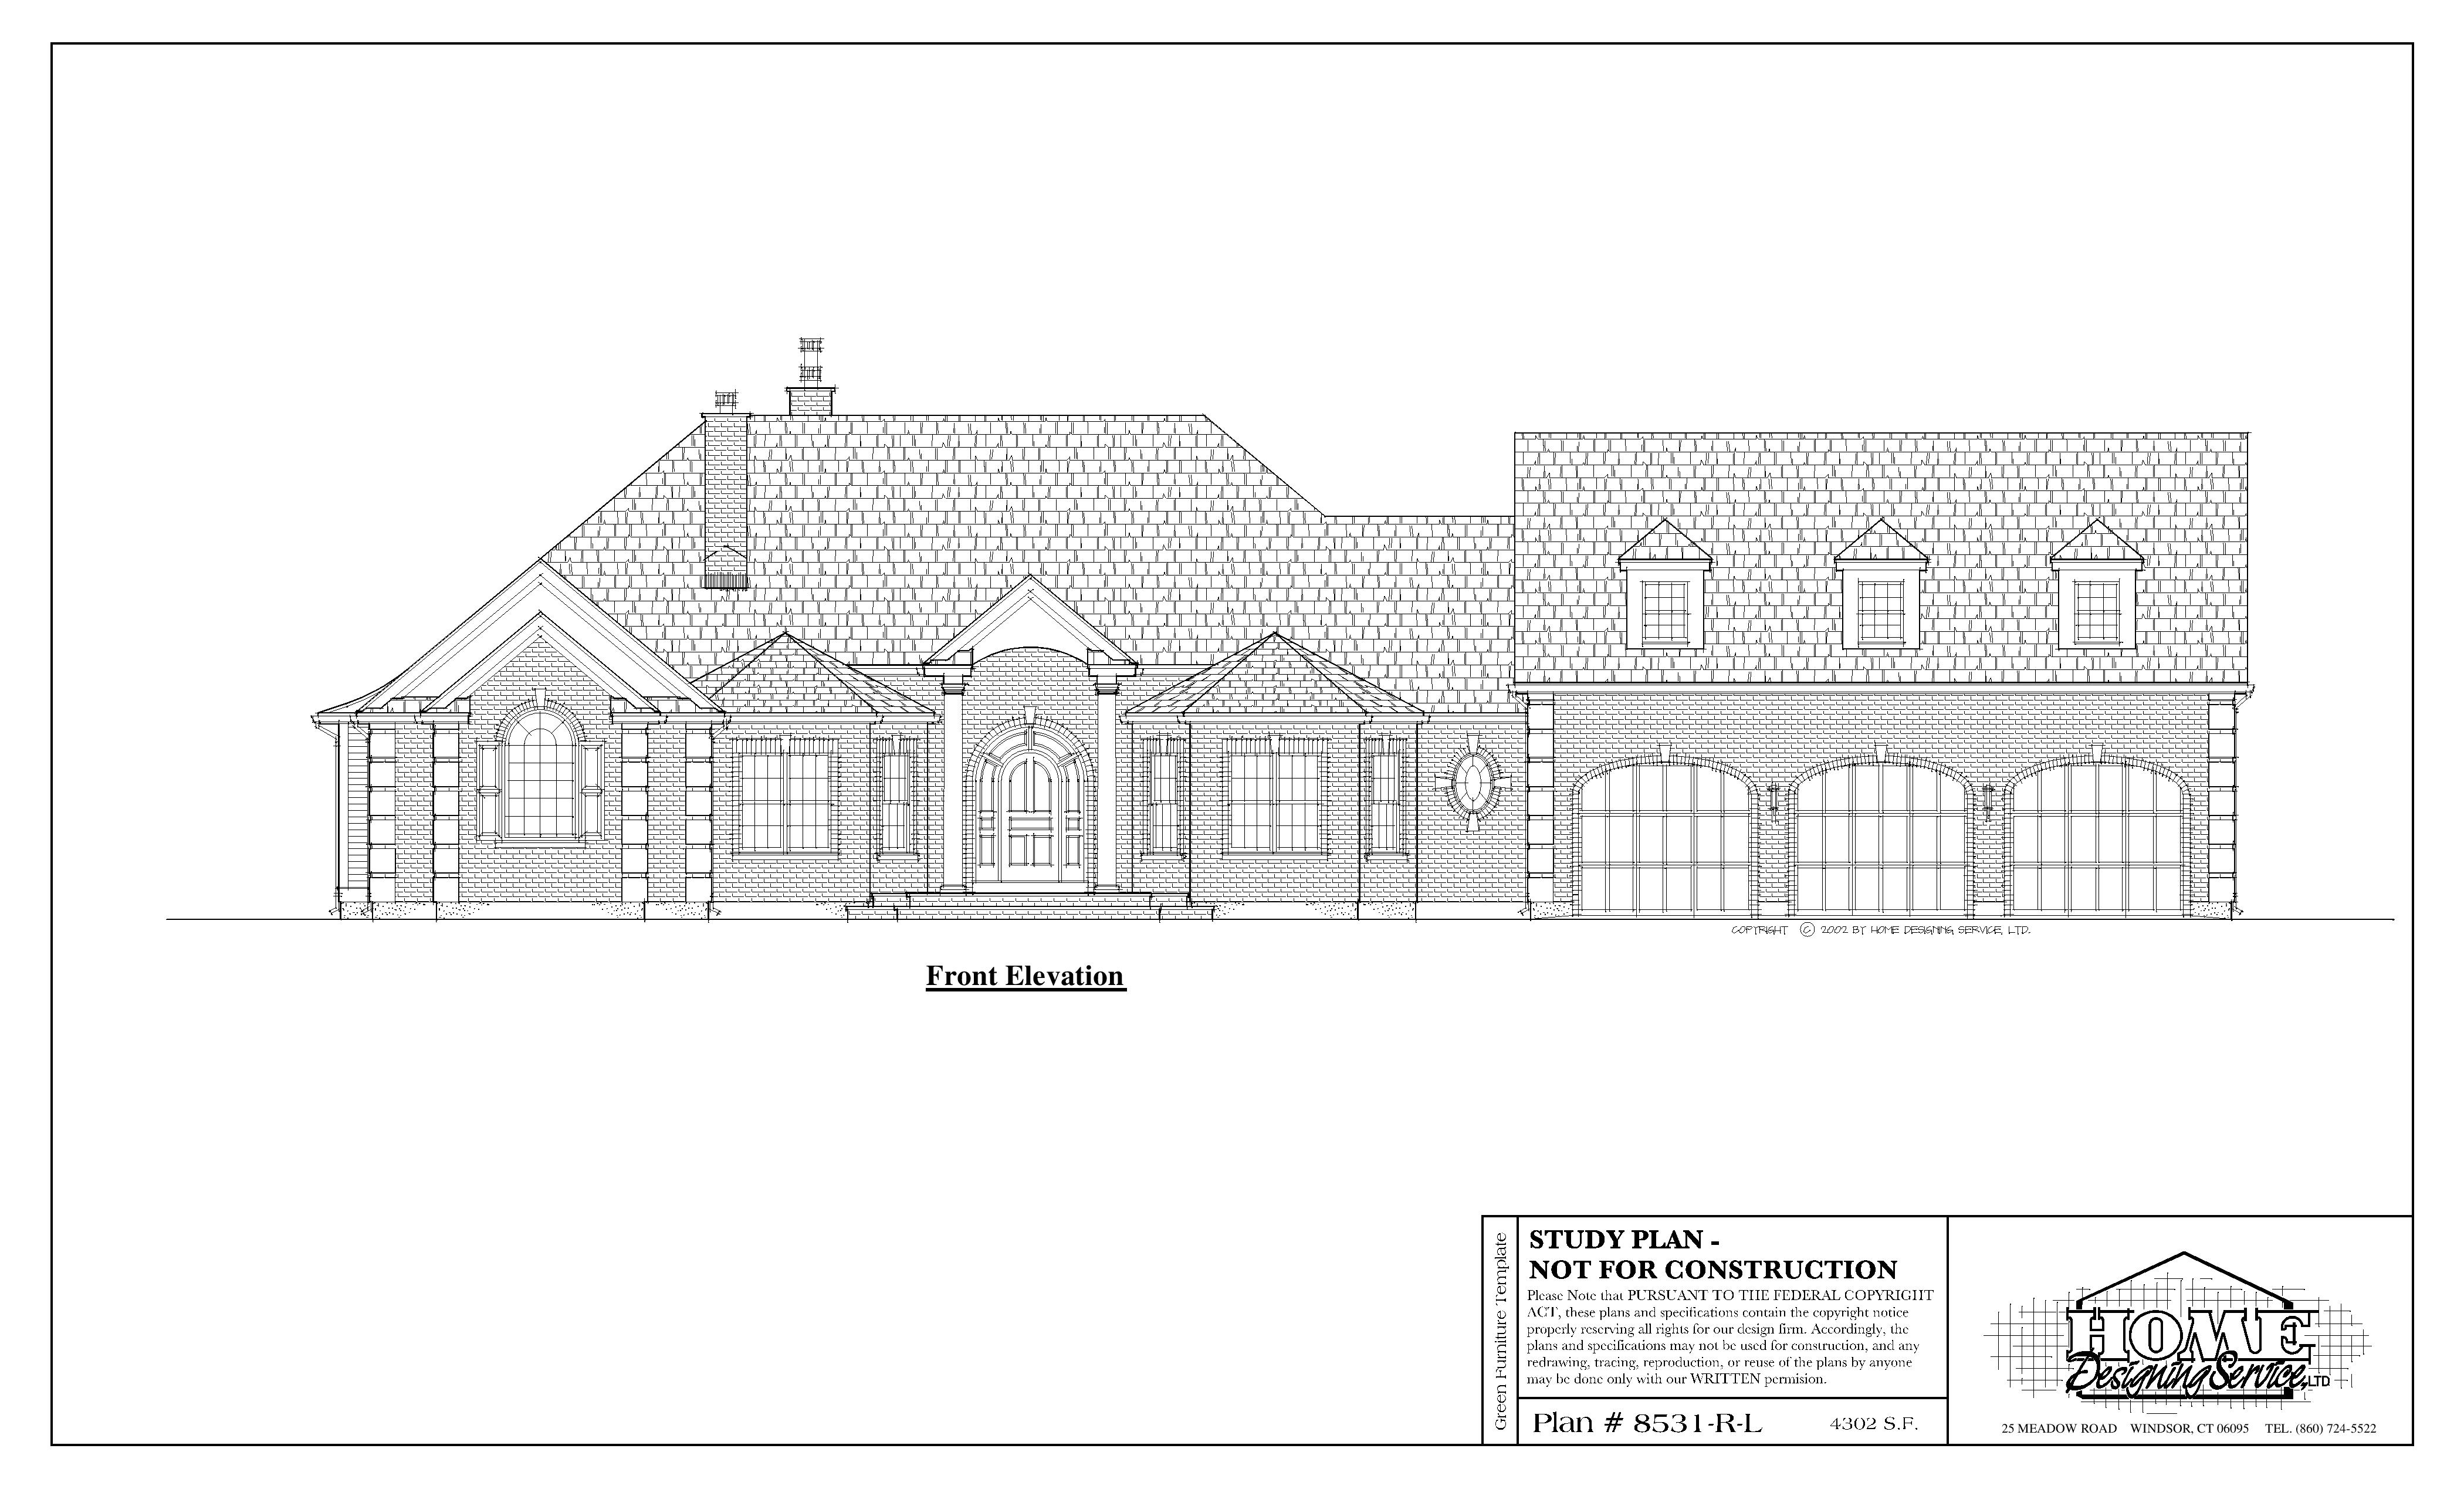 Ranch House Plan 8531-R-L - Home Designing Service Ltd. on